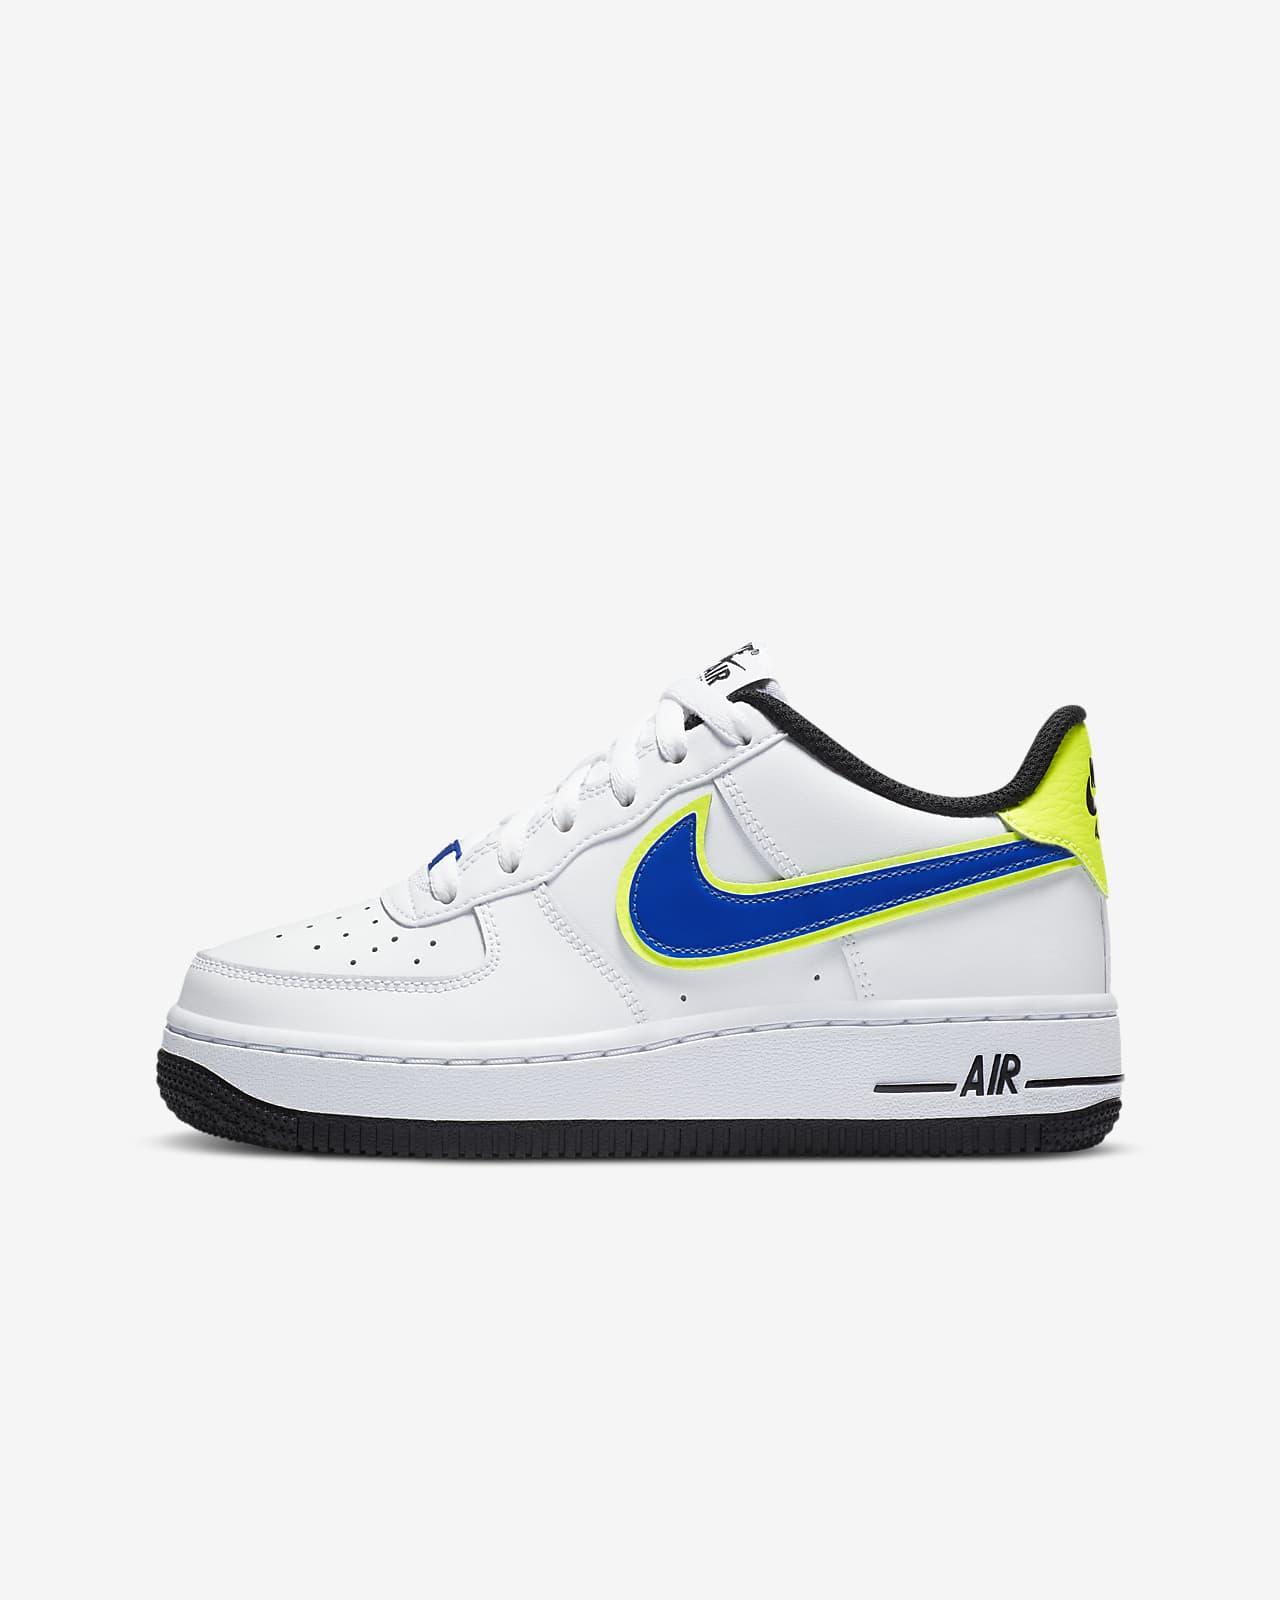 Nike Air Force 1 '07 Kinderschoen